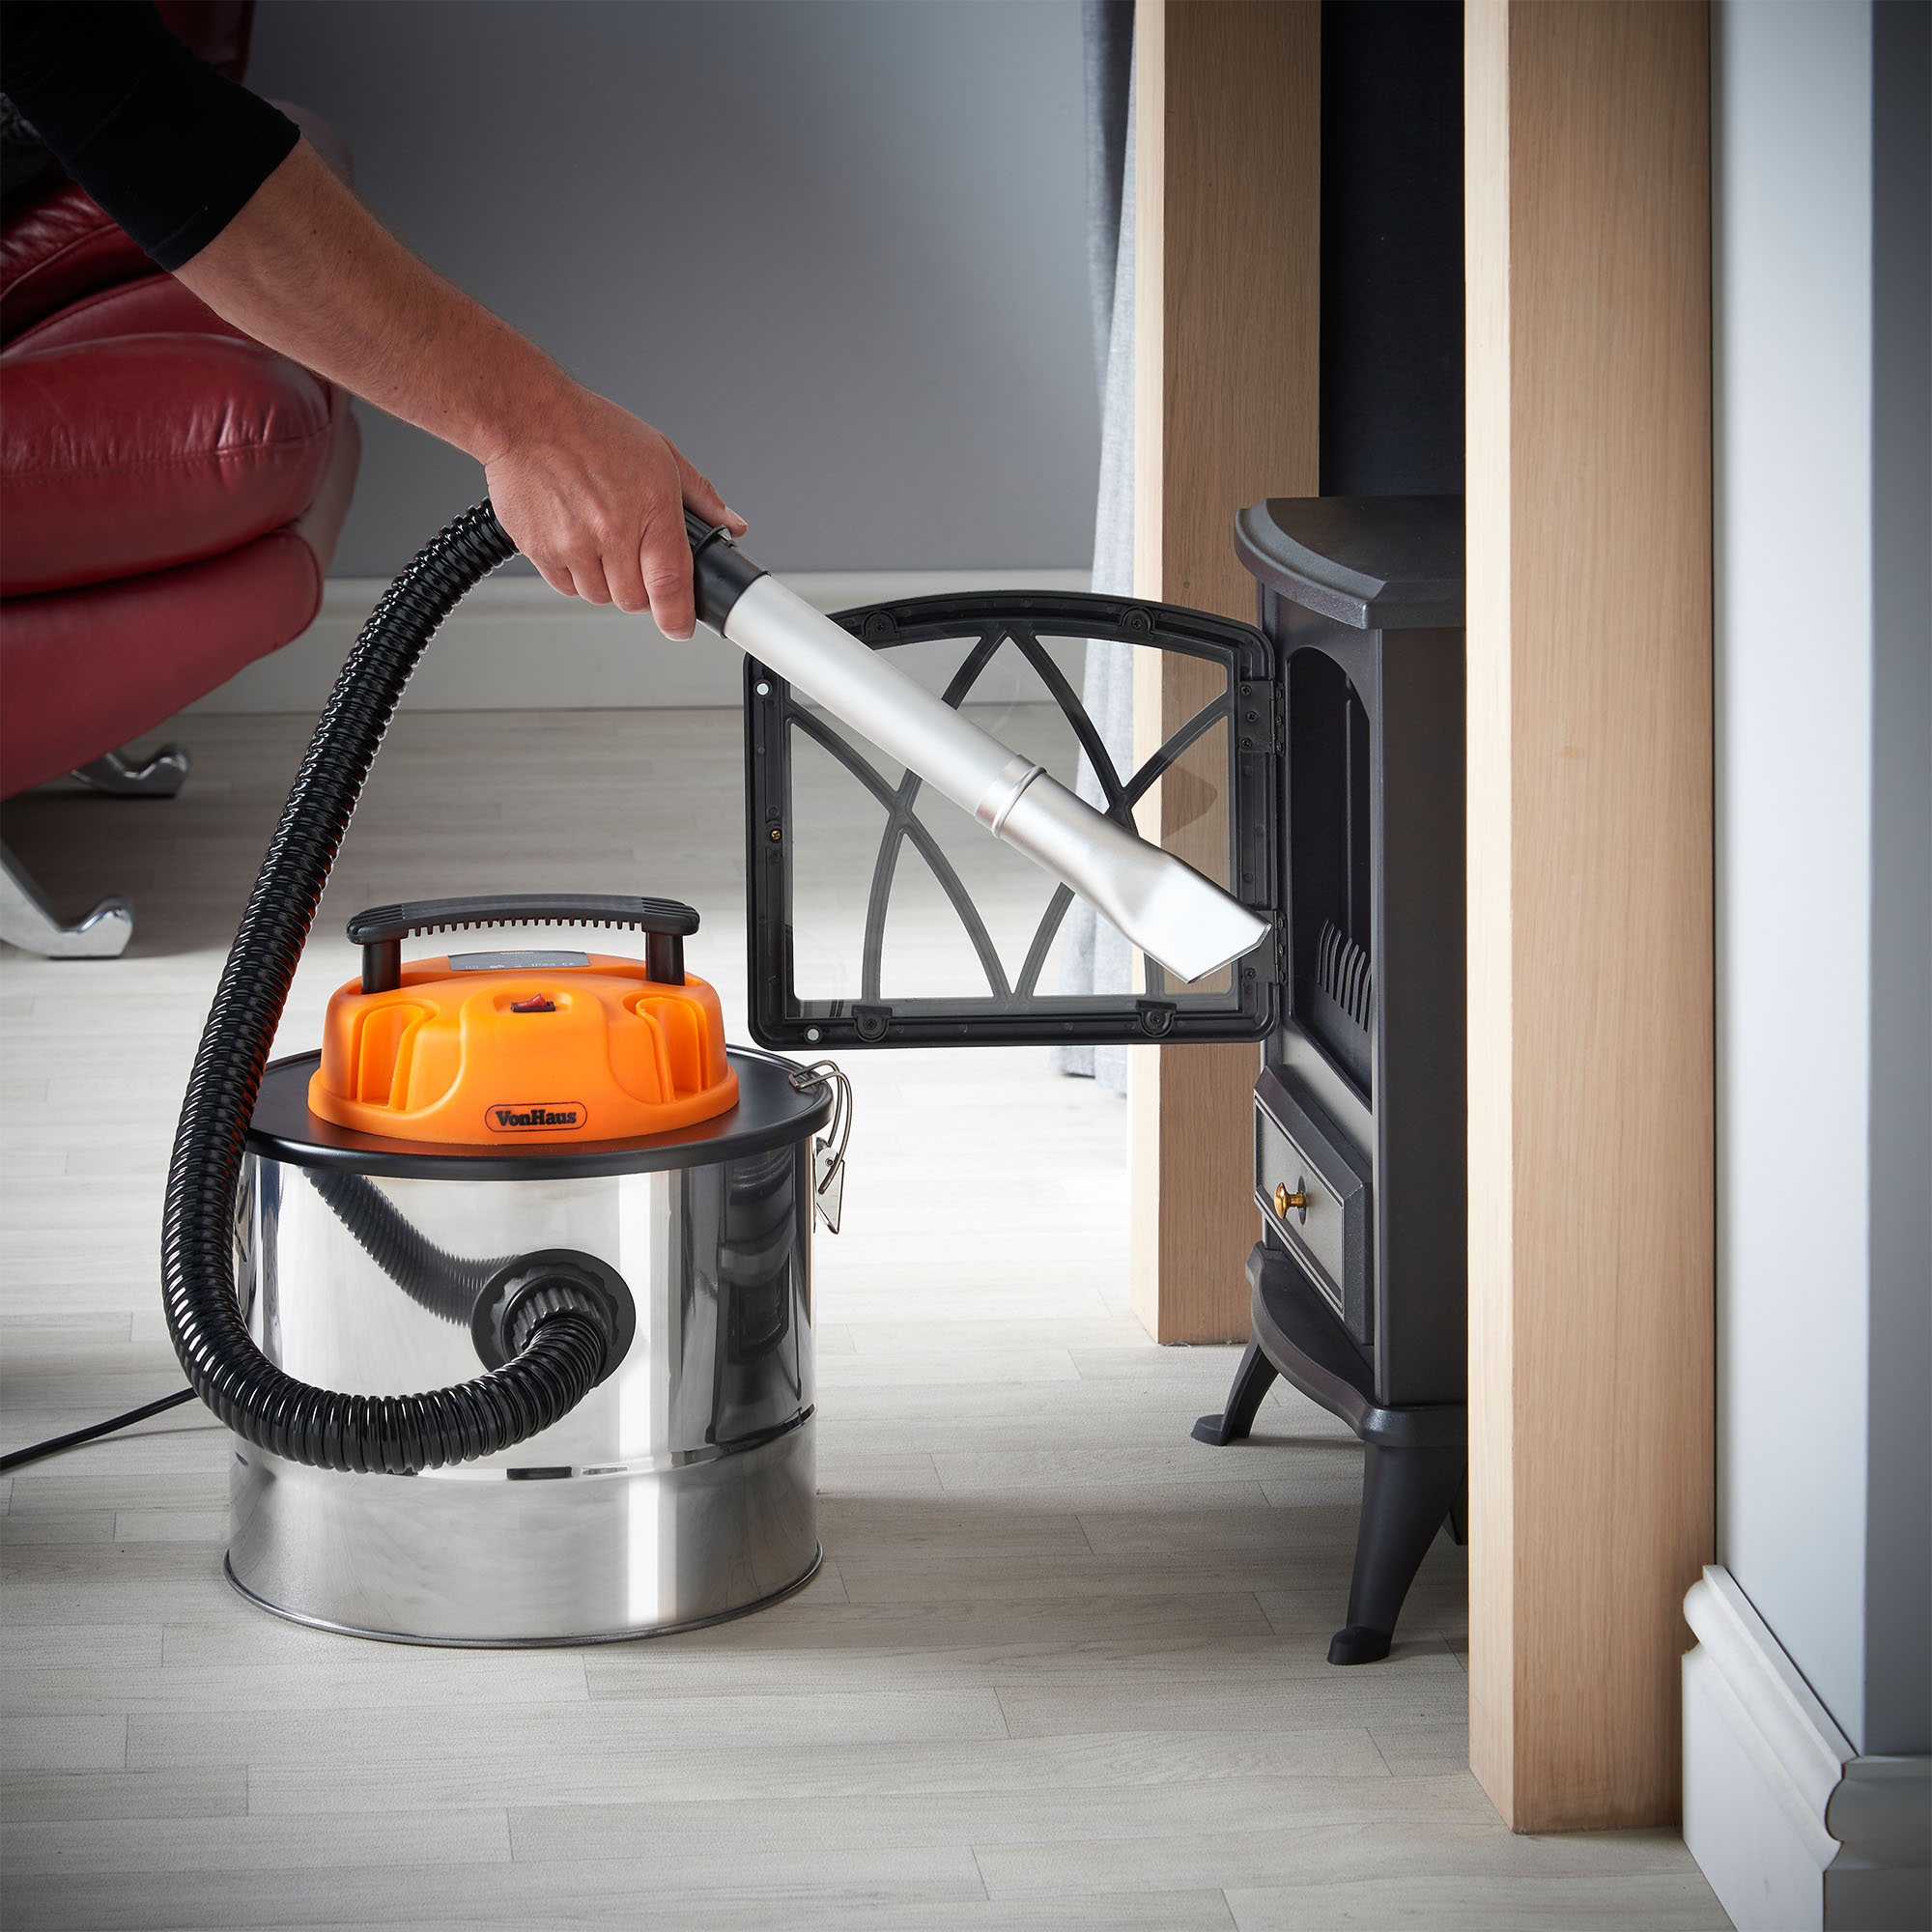 VonHaus 15L Fireplace Ash Vacuum Cleaner Wood Burner BBQ Grill ...